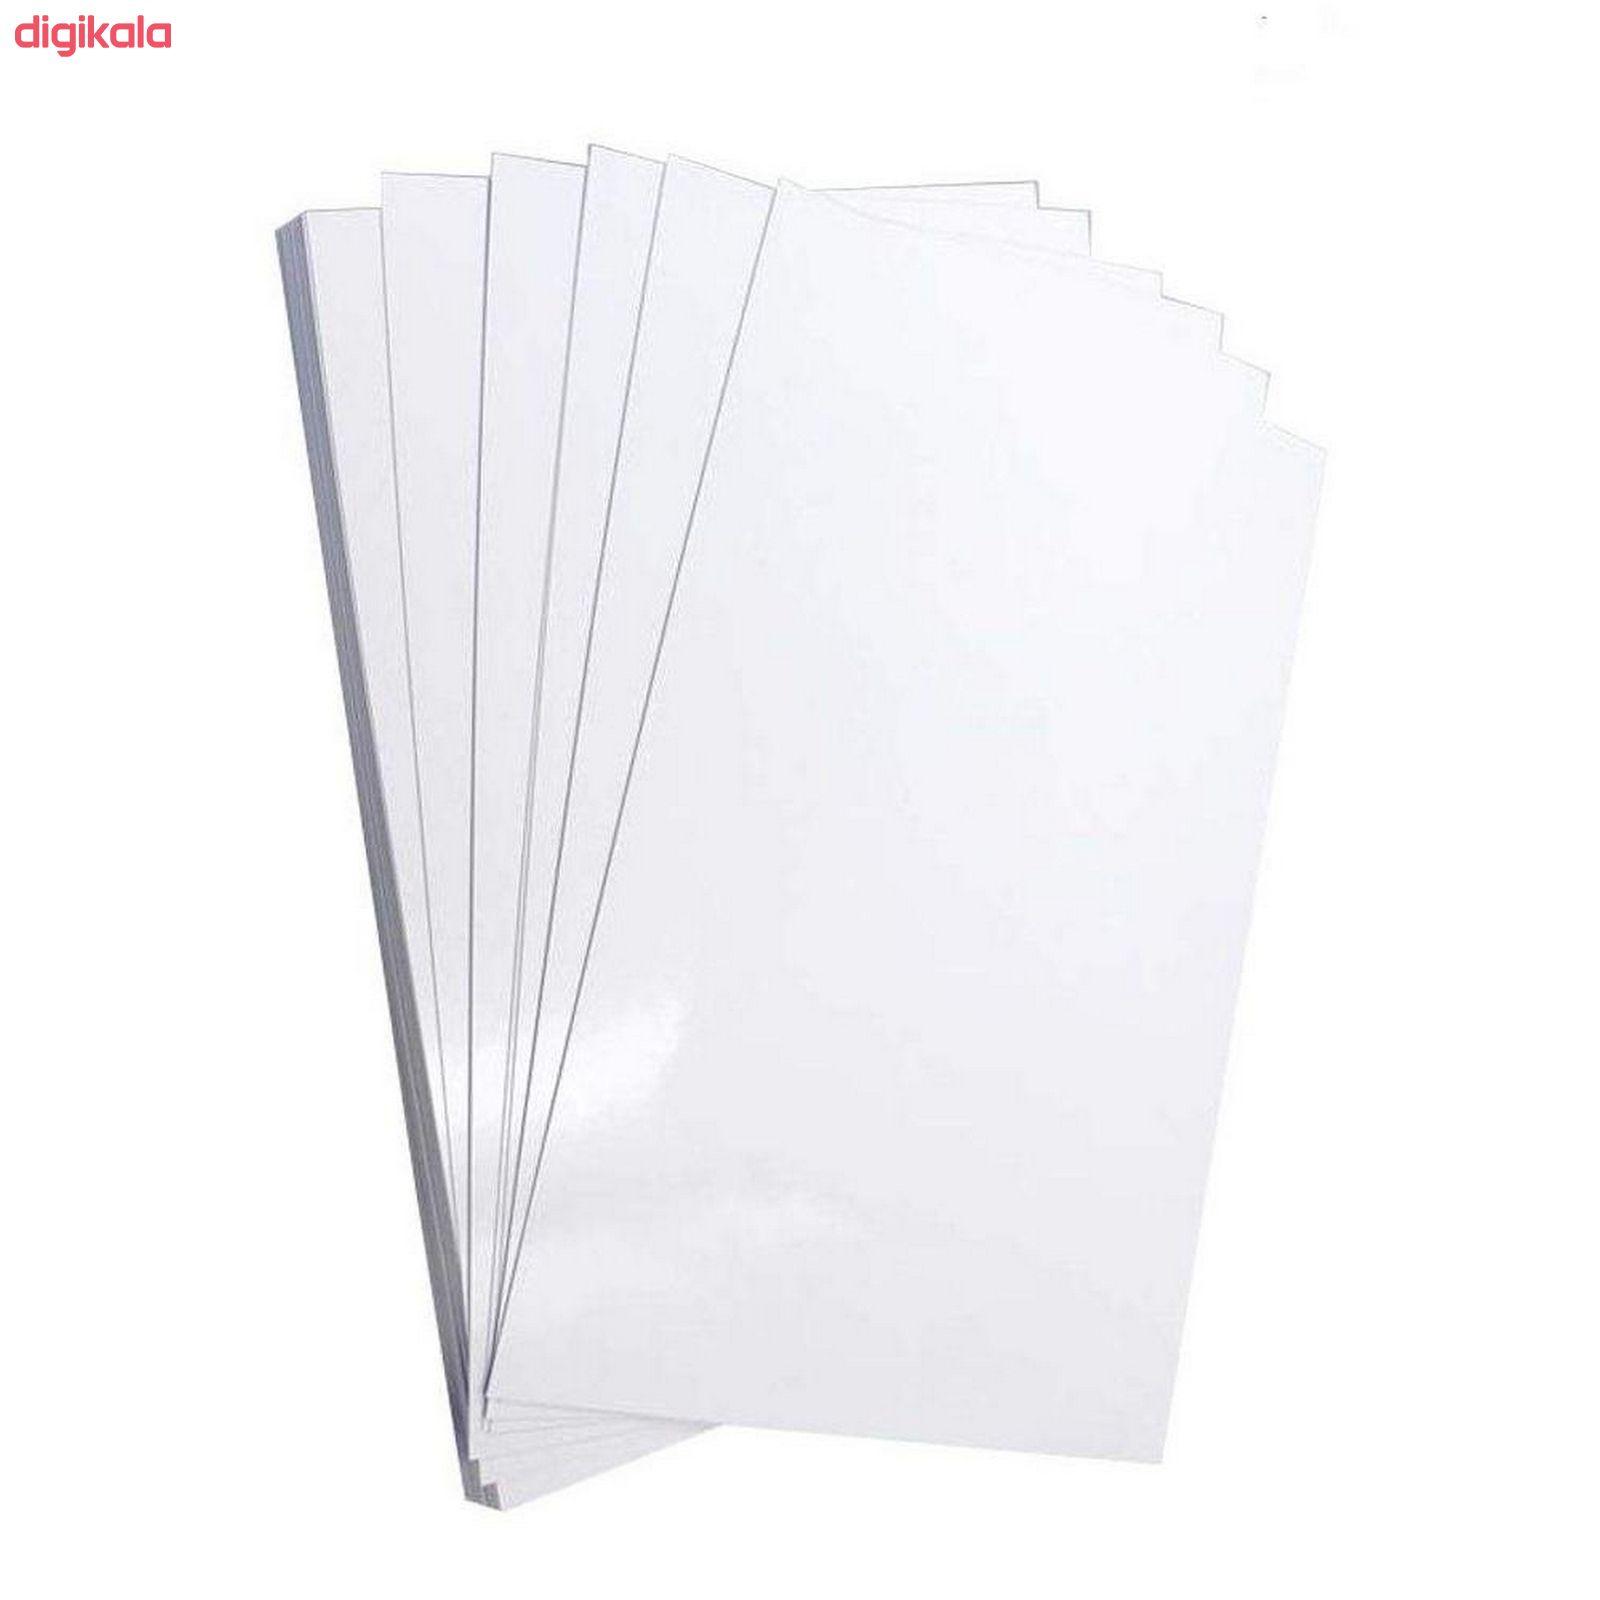 کاغذ A5 هومانه مدل HMNH-5-50 بسته 50 عددی main 1 1